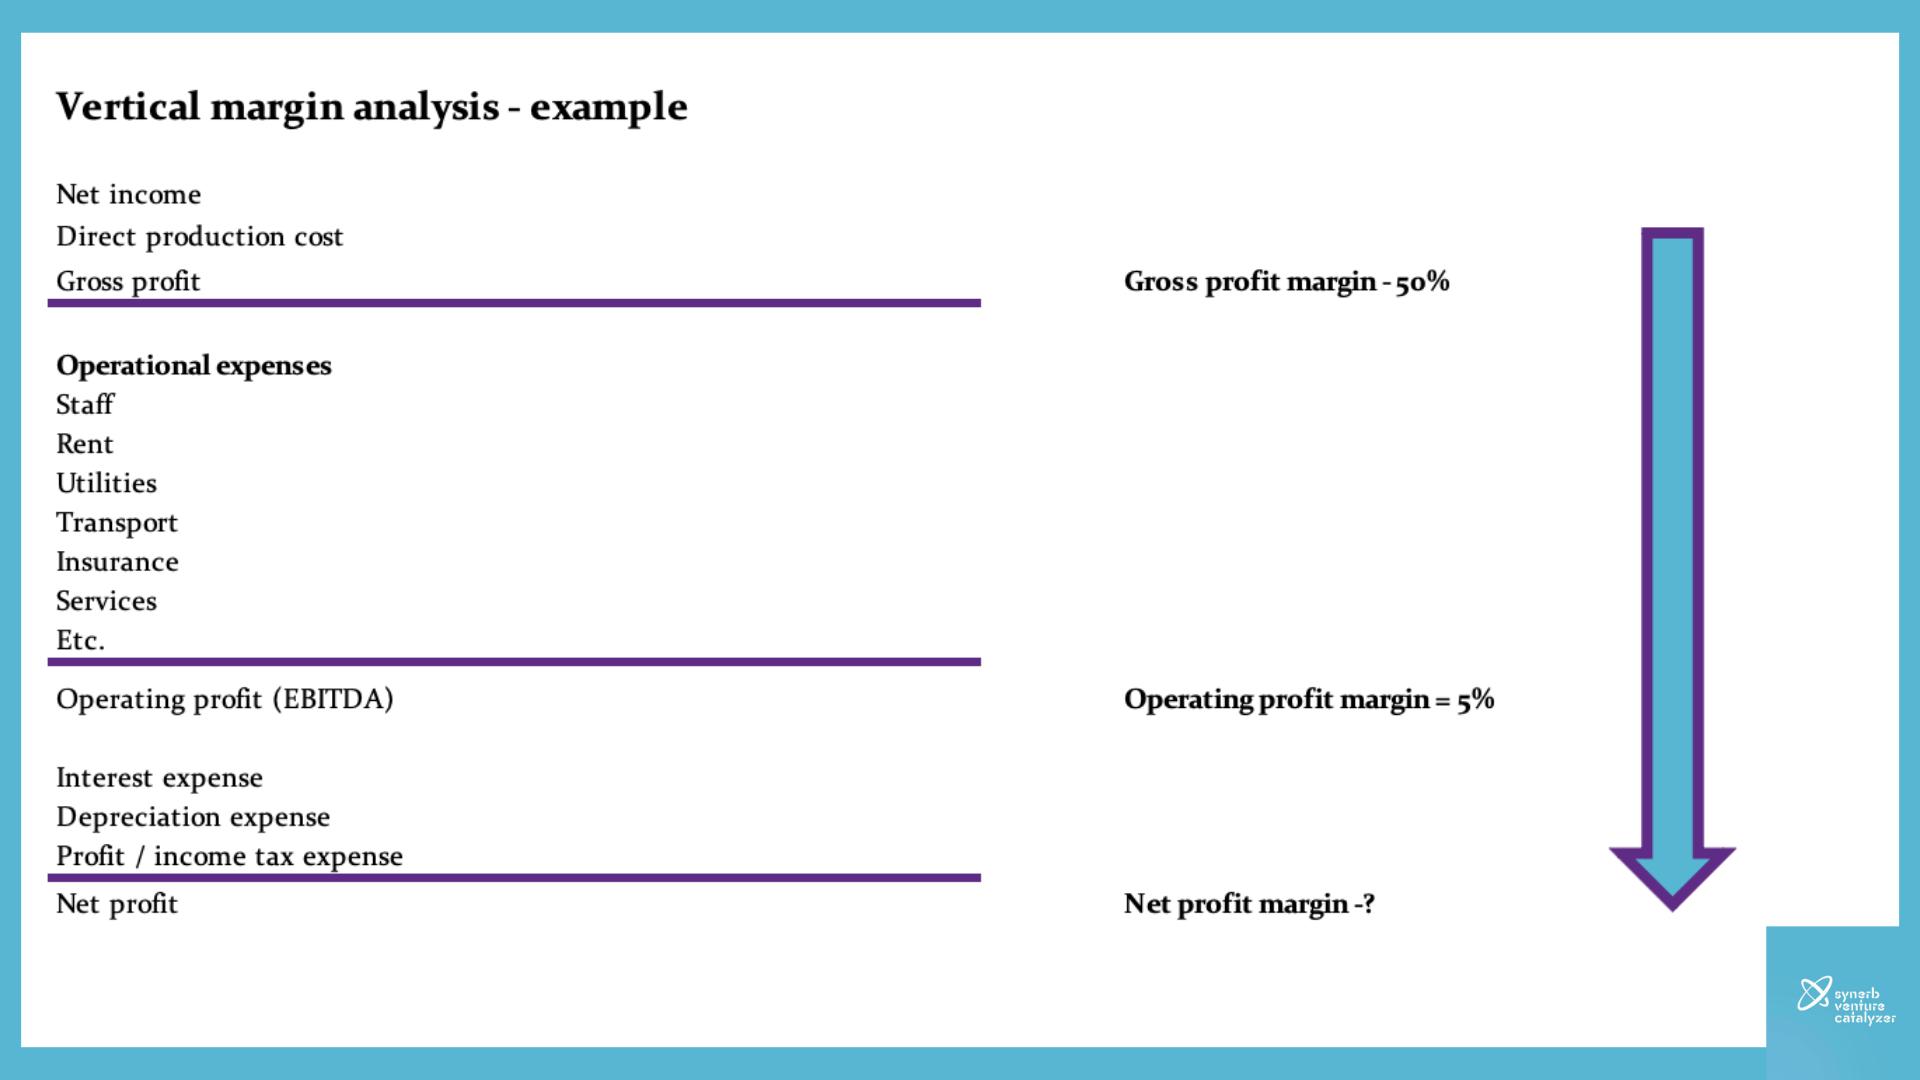 Social Enterprise vertical analysis gross operating net profit margins